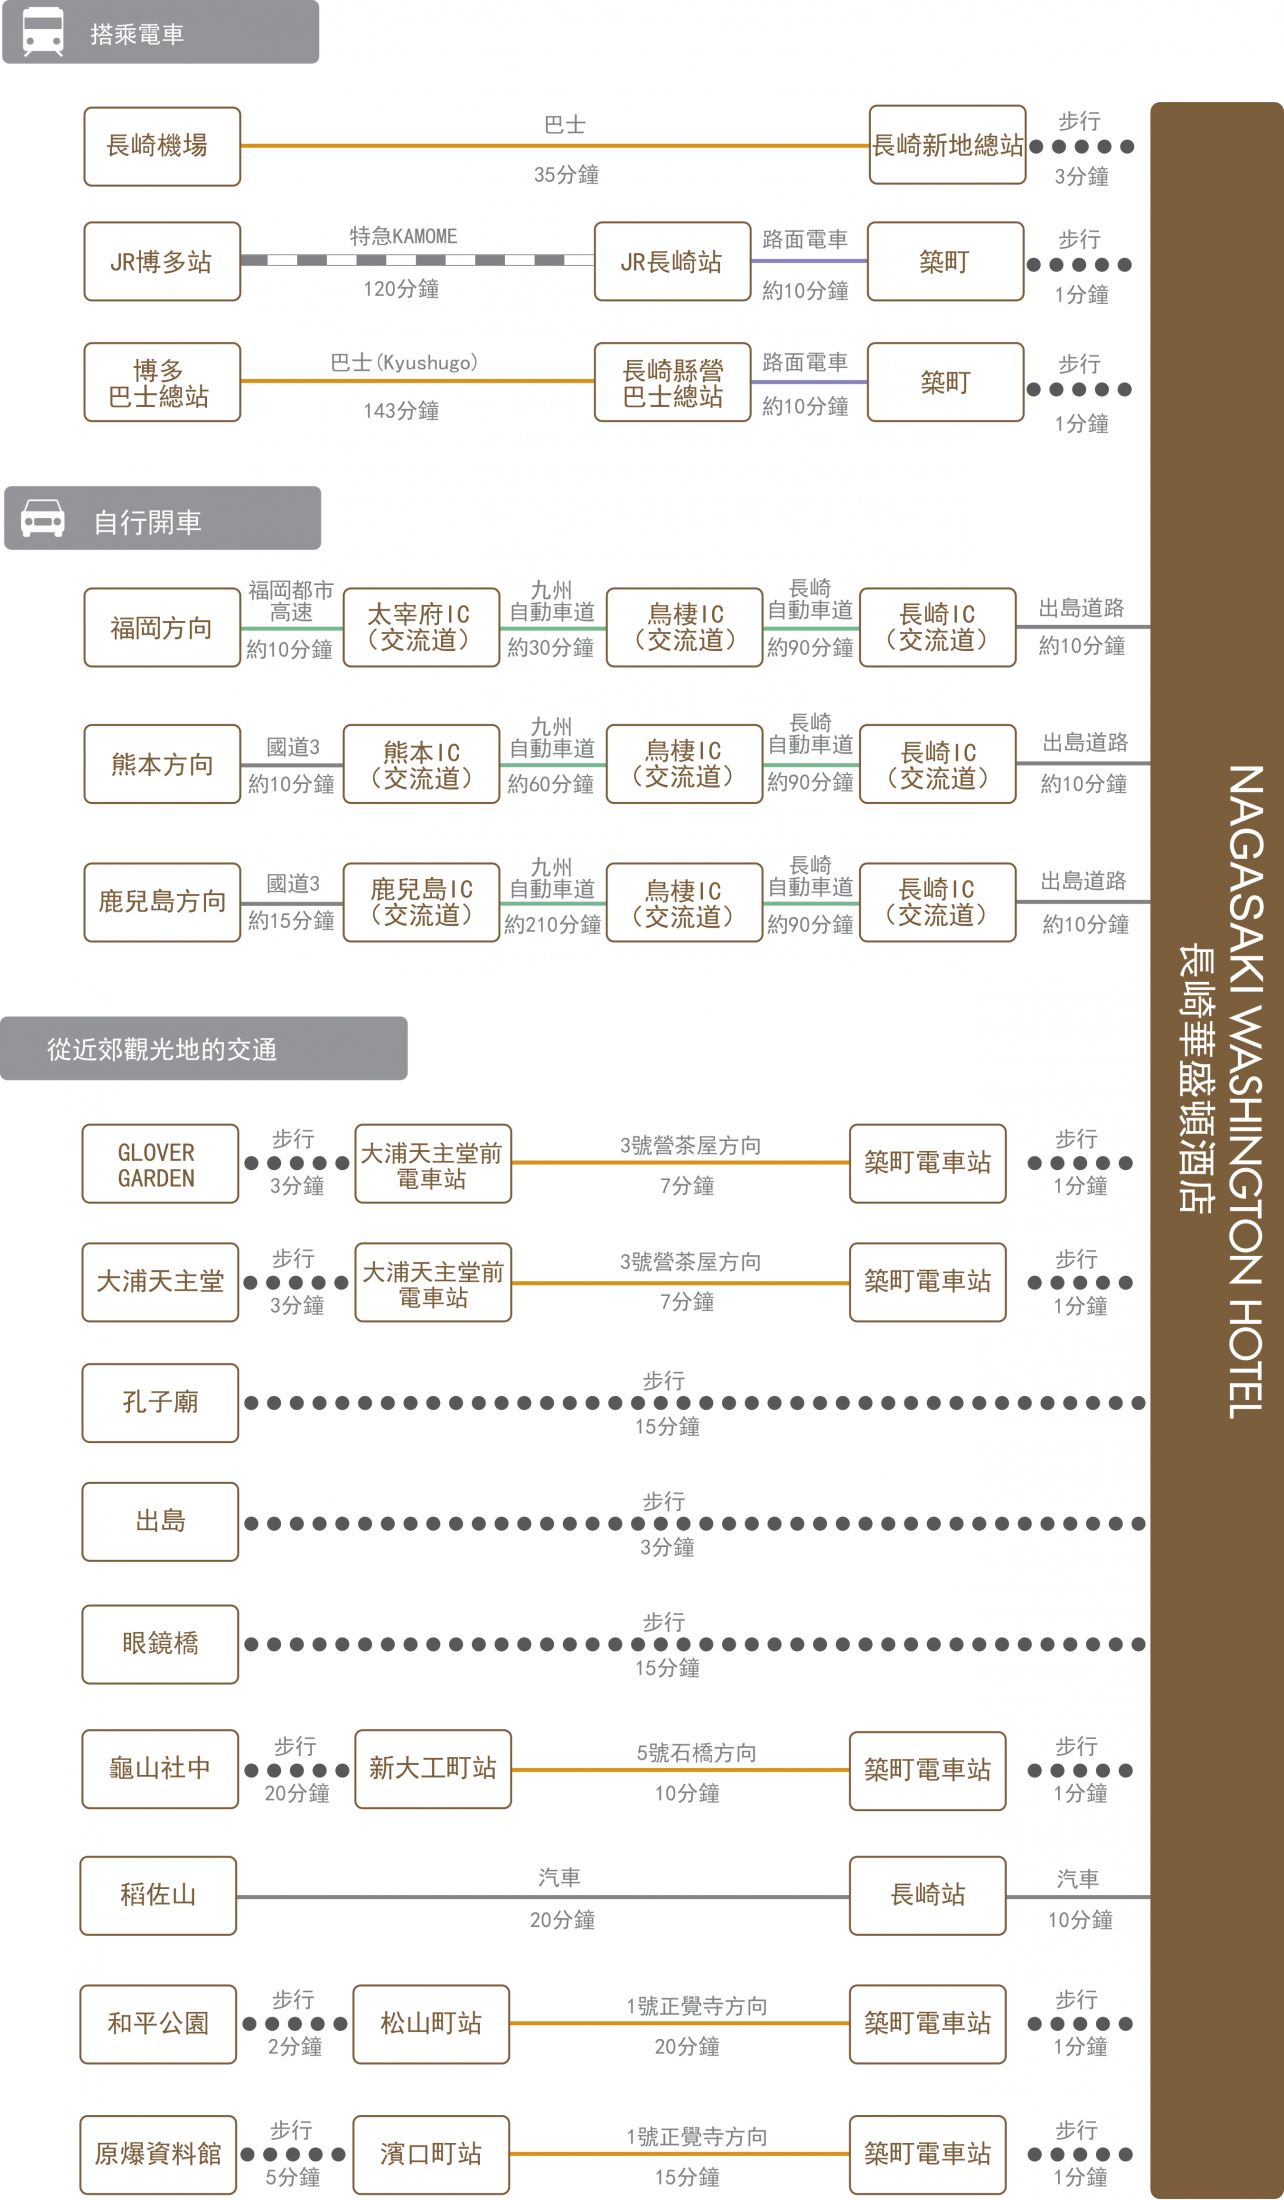 chart_zh_tw_nagasaki_wh